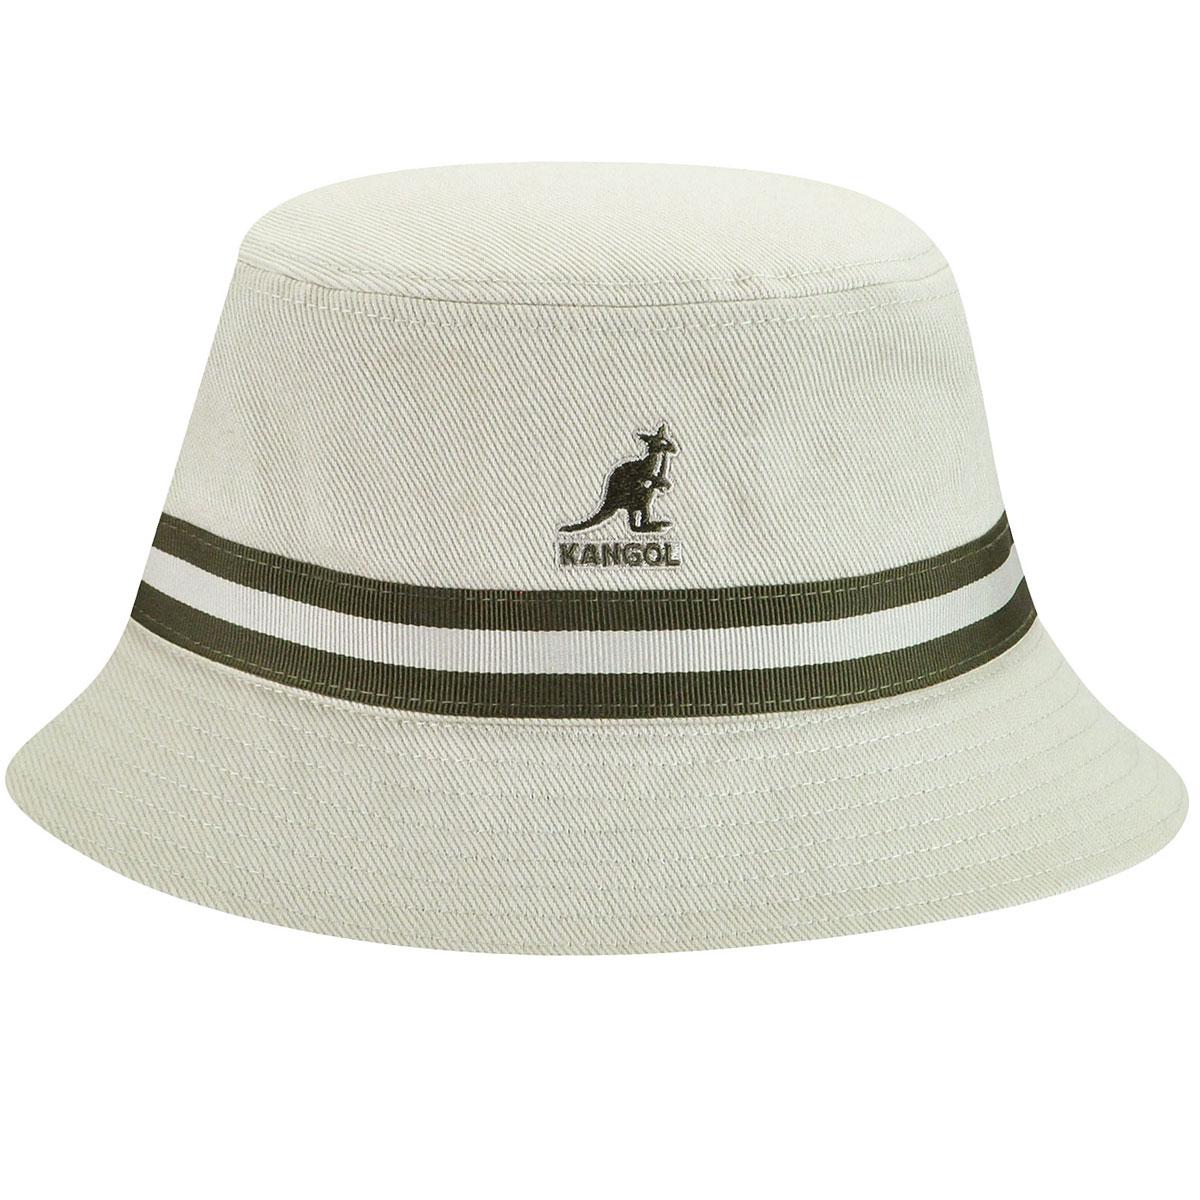 80s Hats, Caps, Visors, Buckets | Women and Men Stripe Lahinch $50.00 AT vintagedancer.com